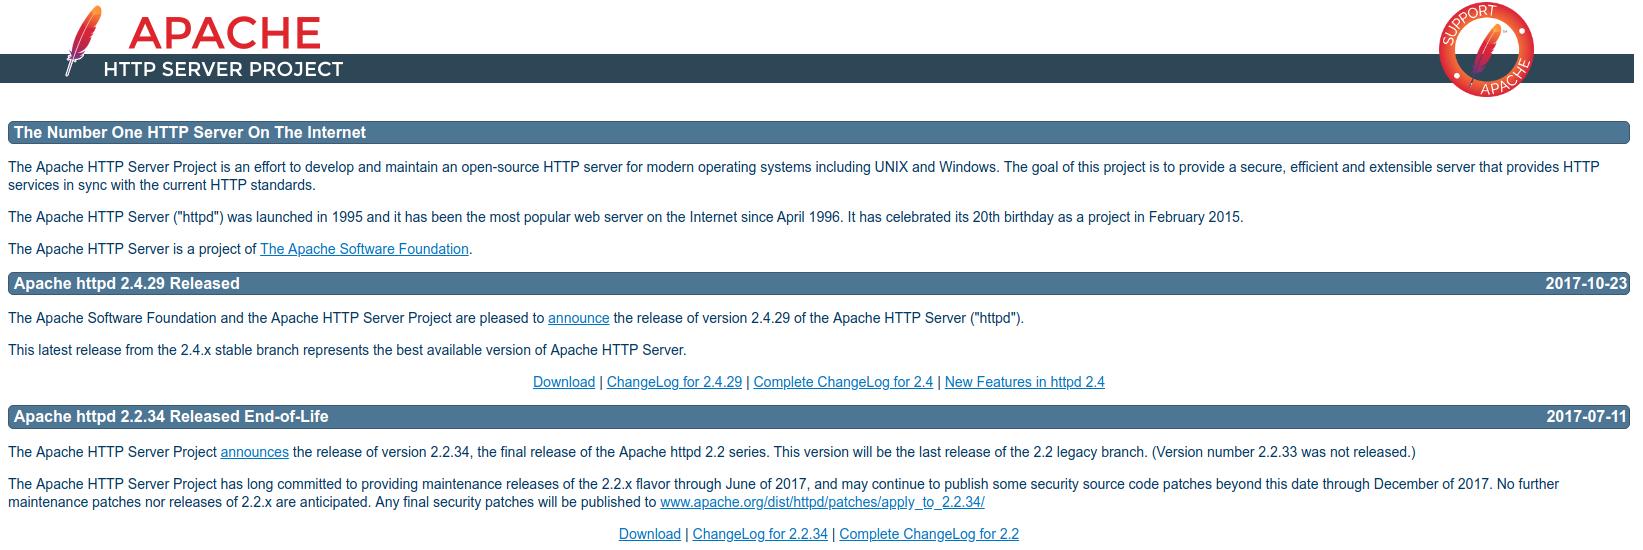 Apache 公式ウェブ